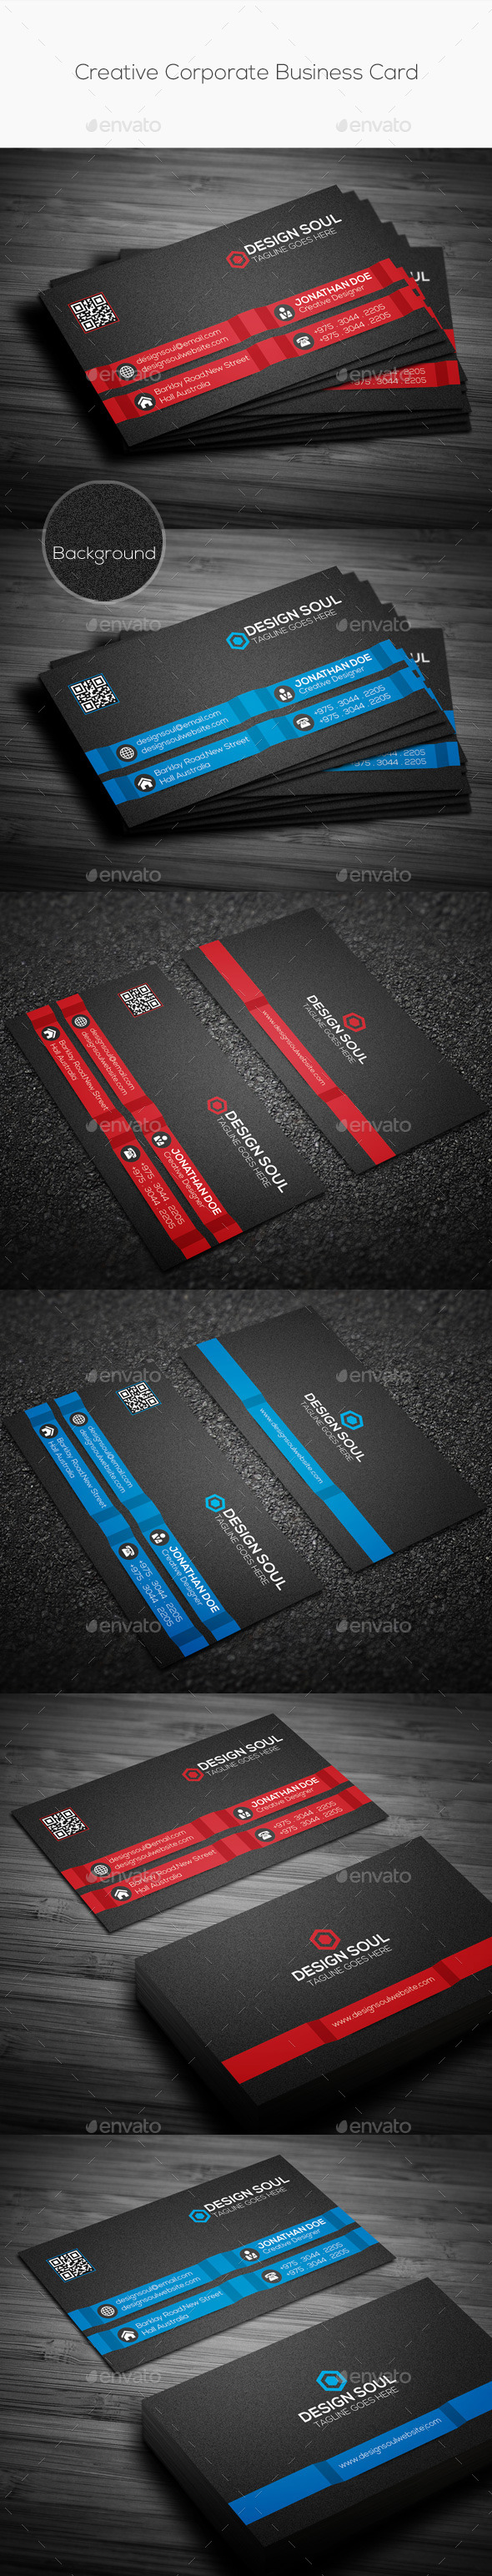 GraphicRiver Creative Corporate Business Card 10178104